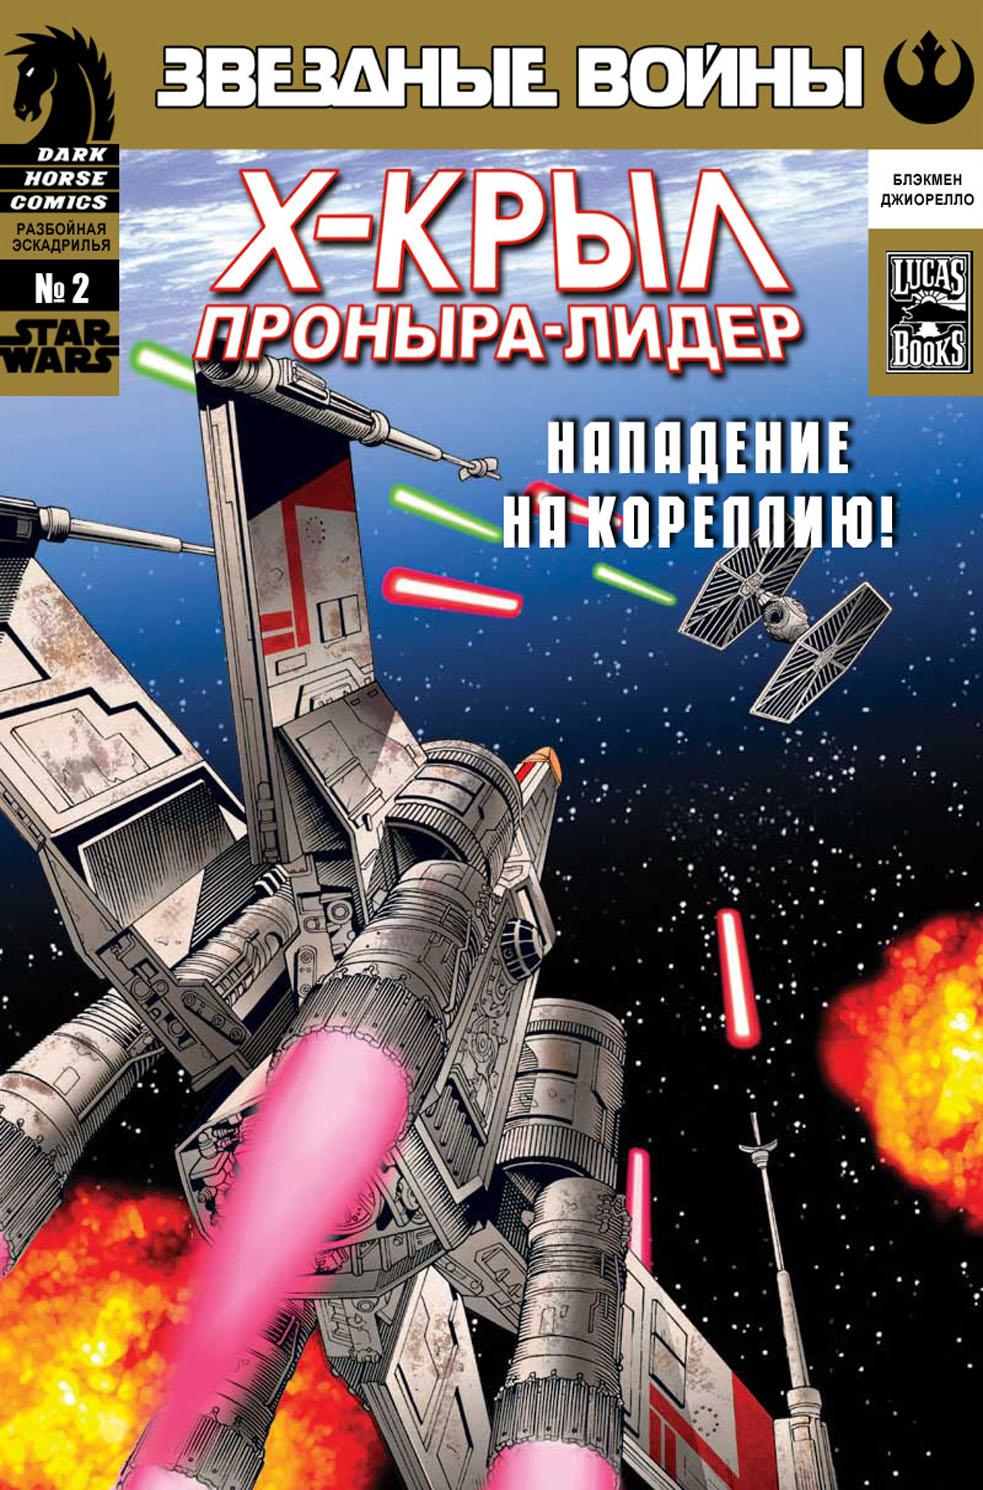 X-wing: Проныра-лидер, часть 2